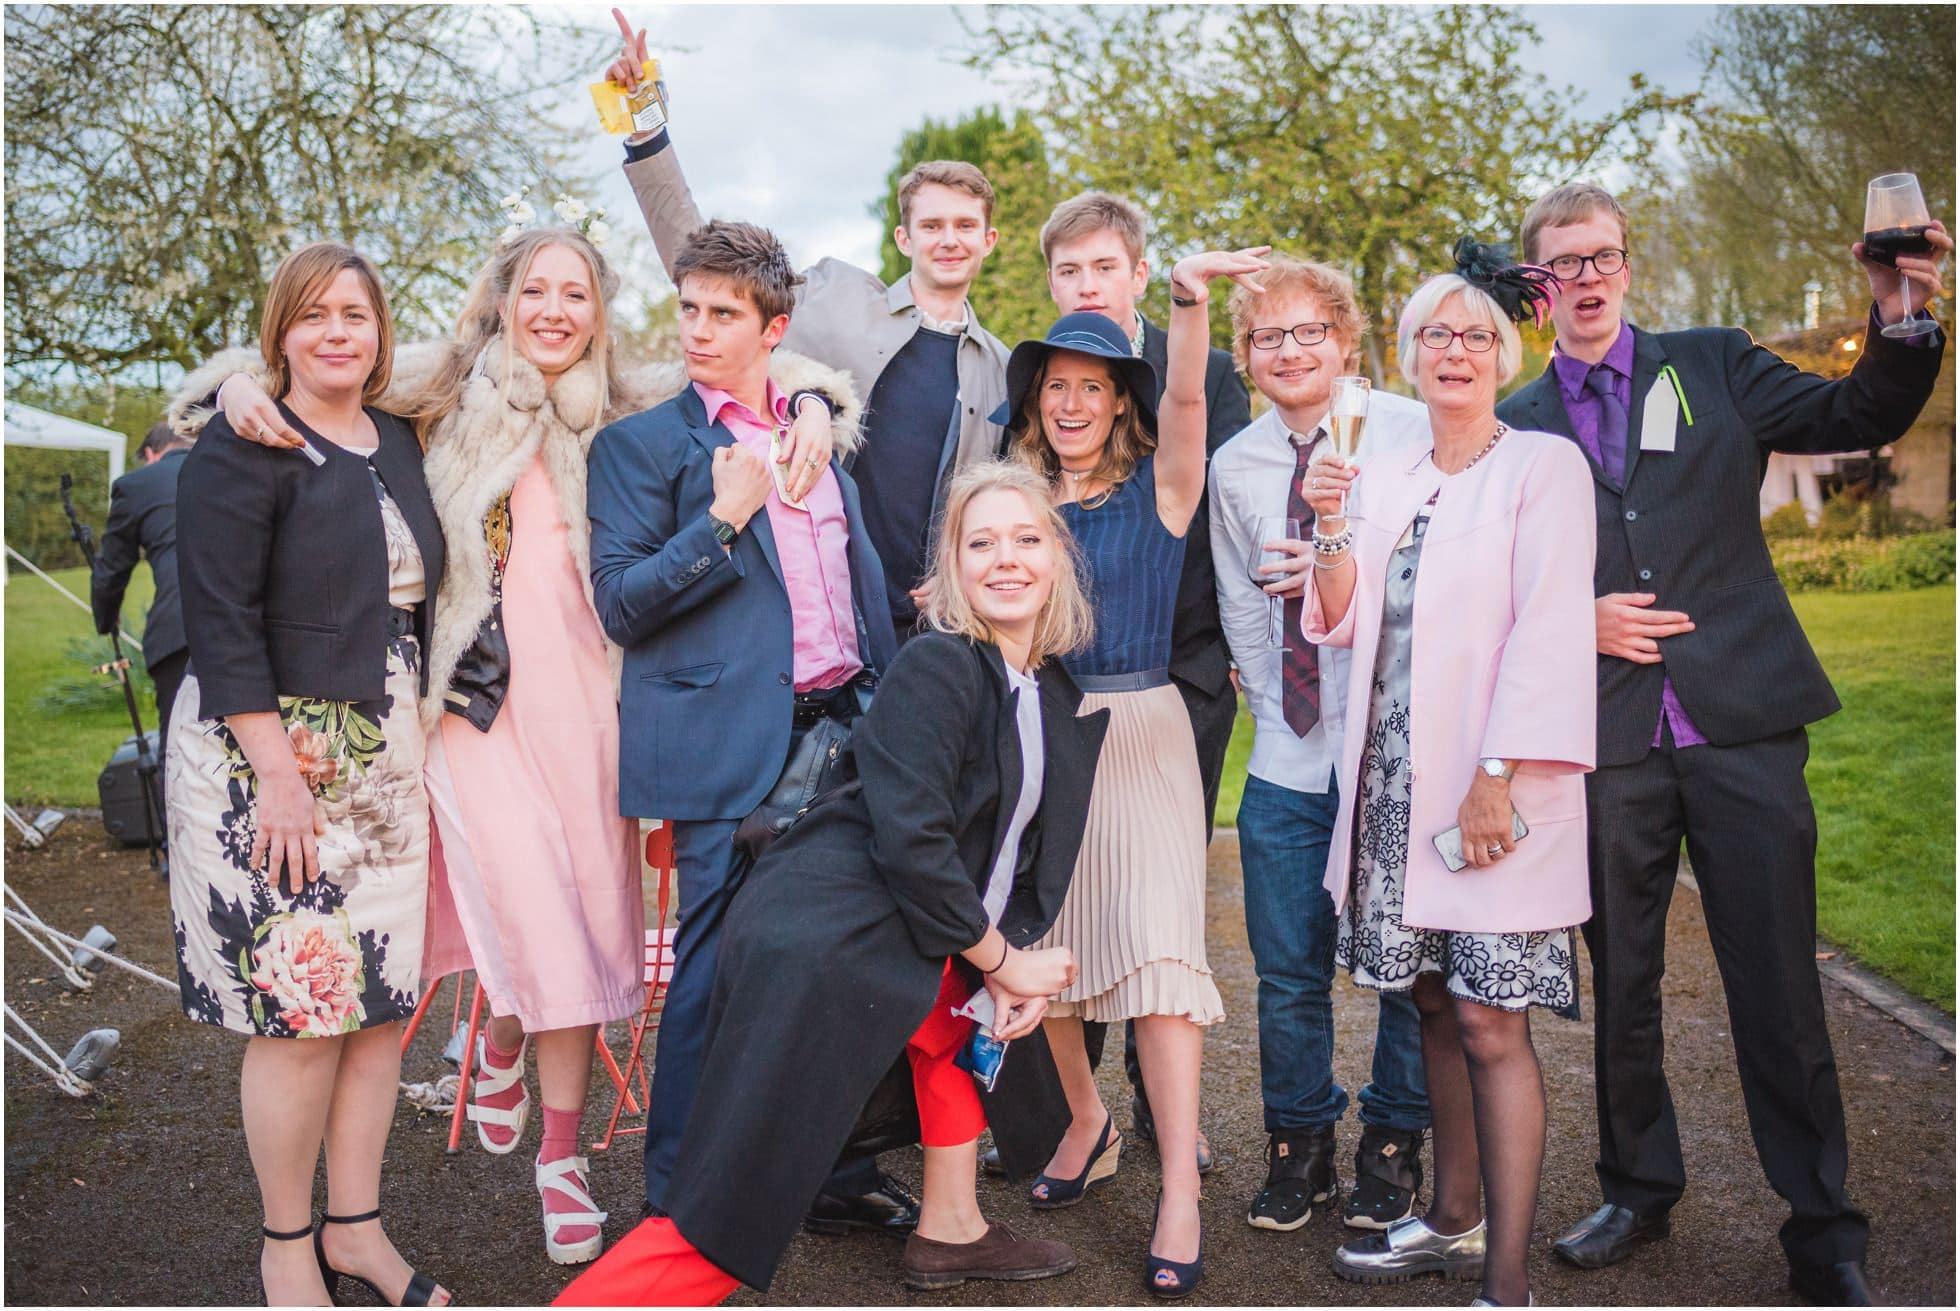 Ed Sheeran with his girlfriend and her relatives enjoying an amazing York wedding